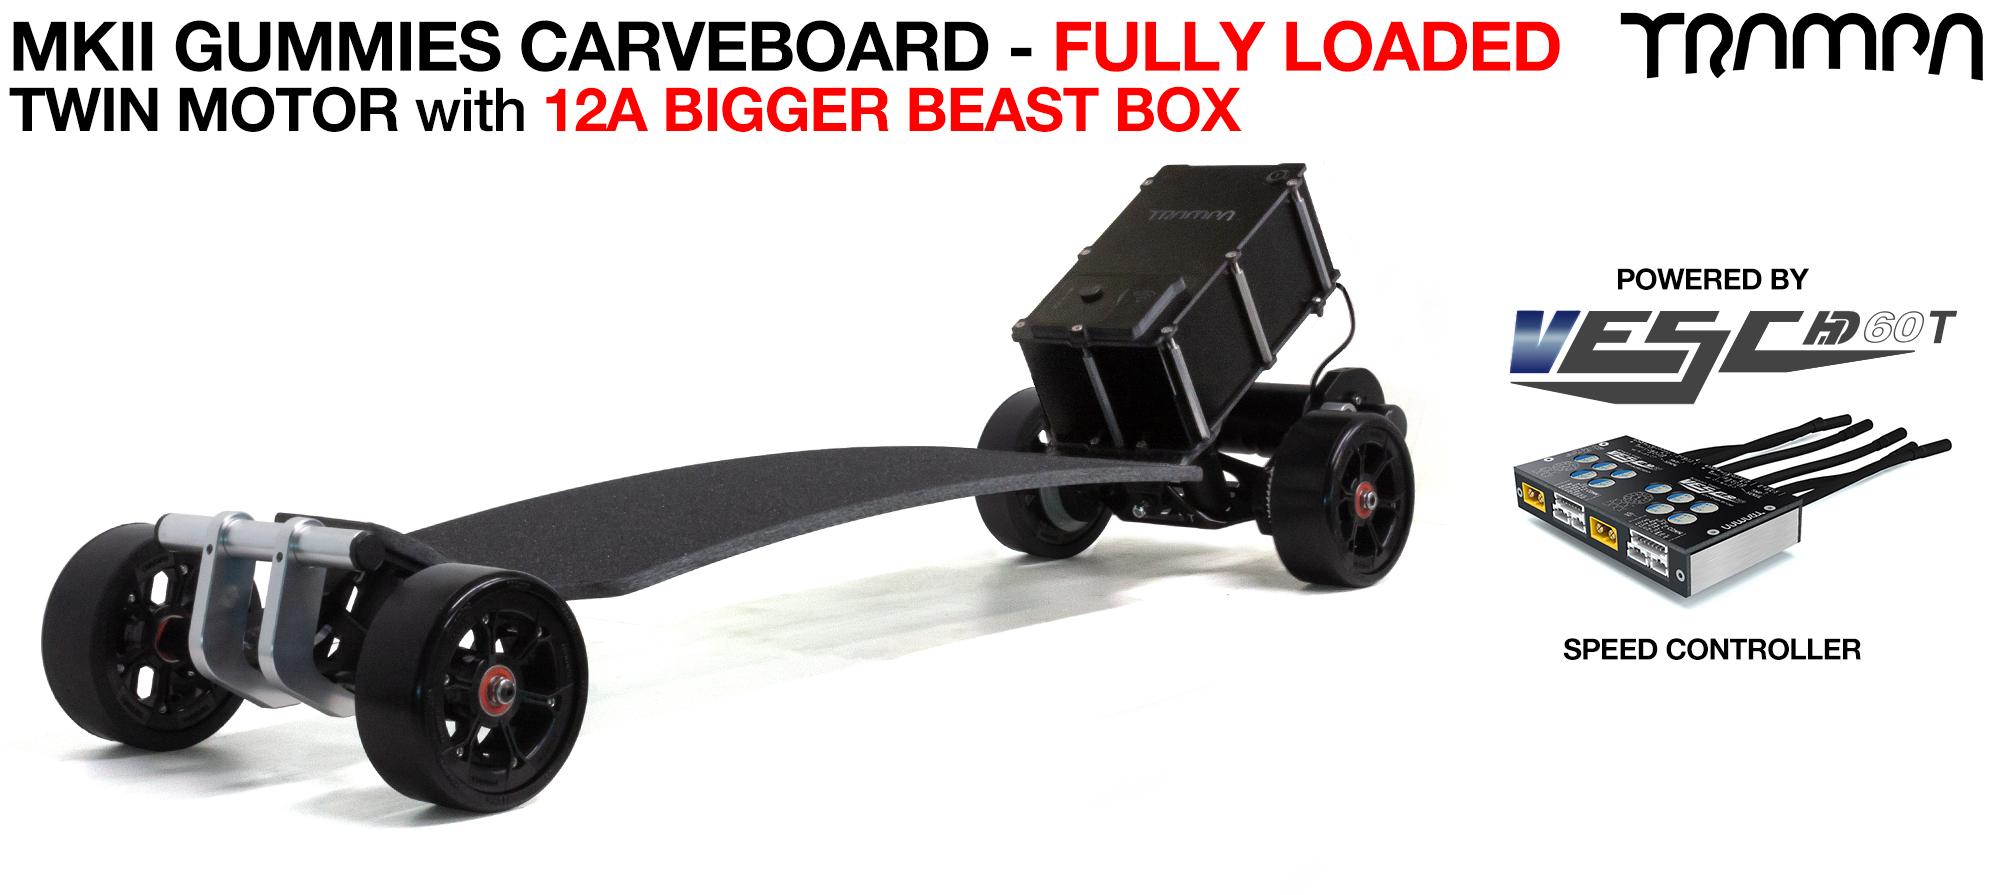 TRAMPA's MkII Electric GUMMIES Carveboard - uses Mini Spring Trucks with MkII Carve board Motor Mounts Custom TRAMPA hubs & 125mm GUMMIES longboard Tyres - TWIN Motor 12A FULLY LOADED